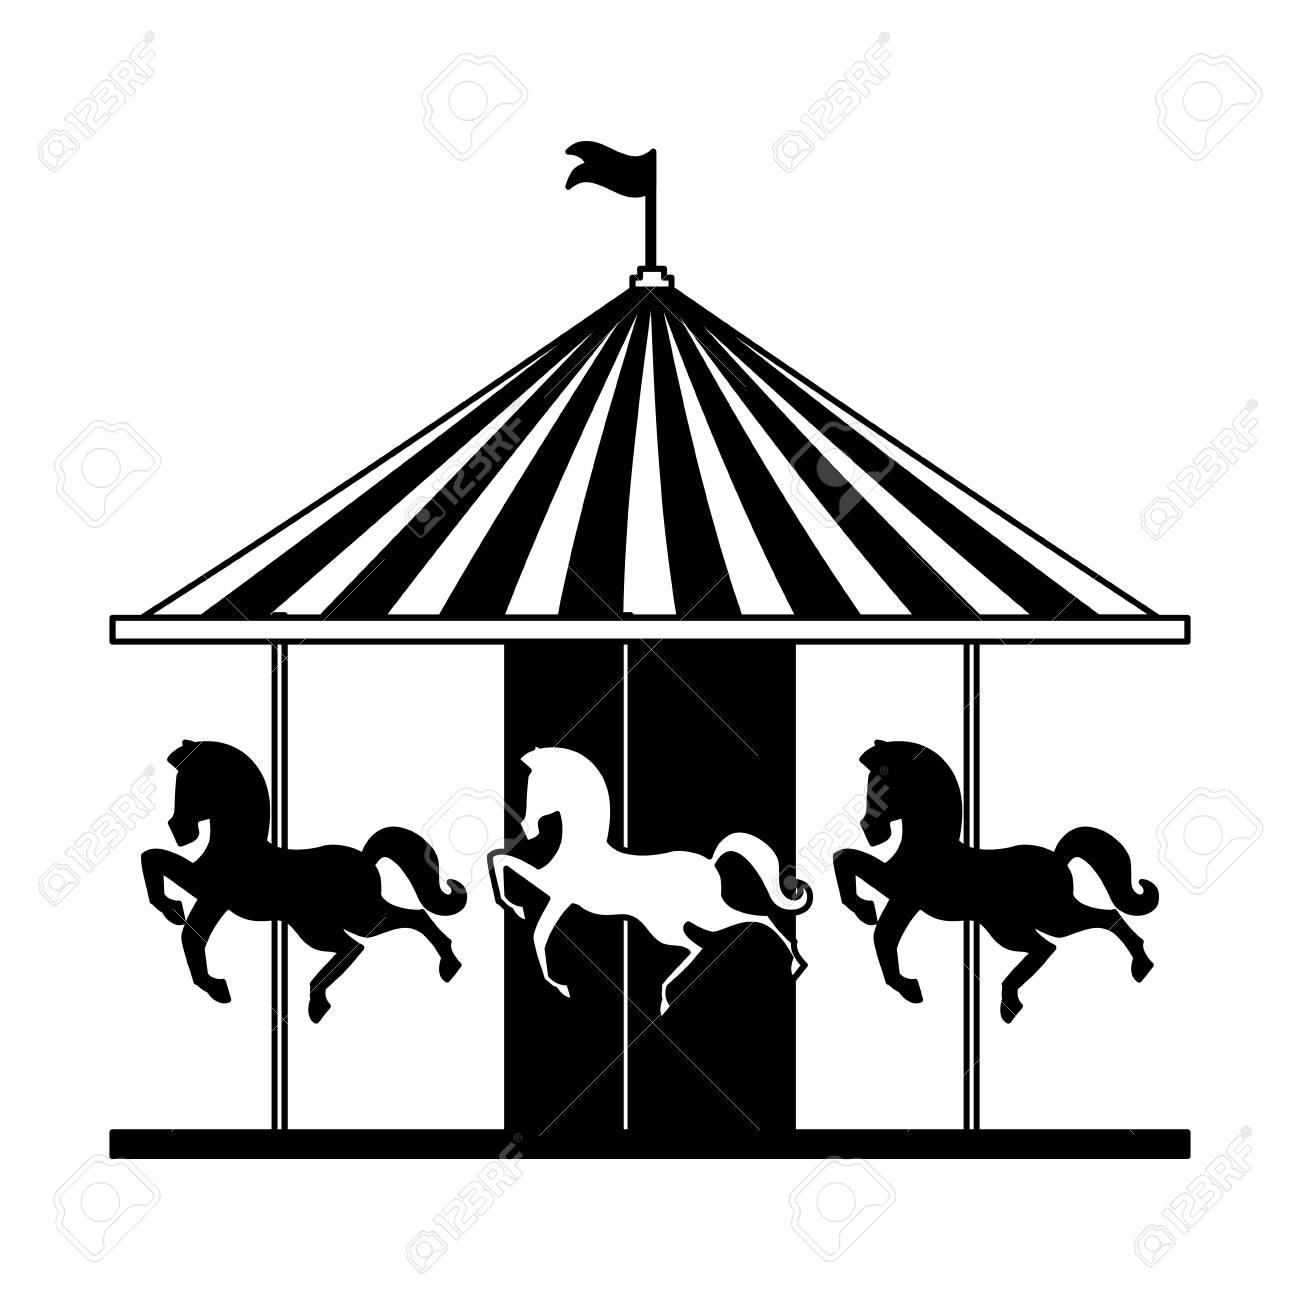 Carousel Horses Fun Fair Circus Carnival Vector Illustration Royalty Free Cliparts Vectors And Stock Illustration Image 111413106